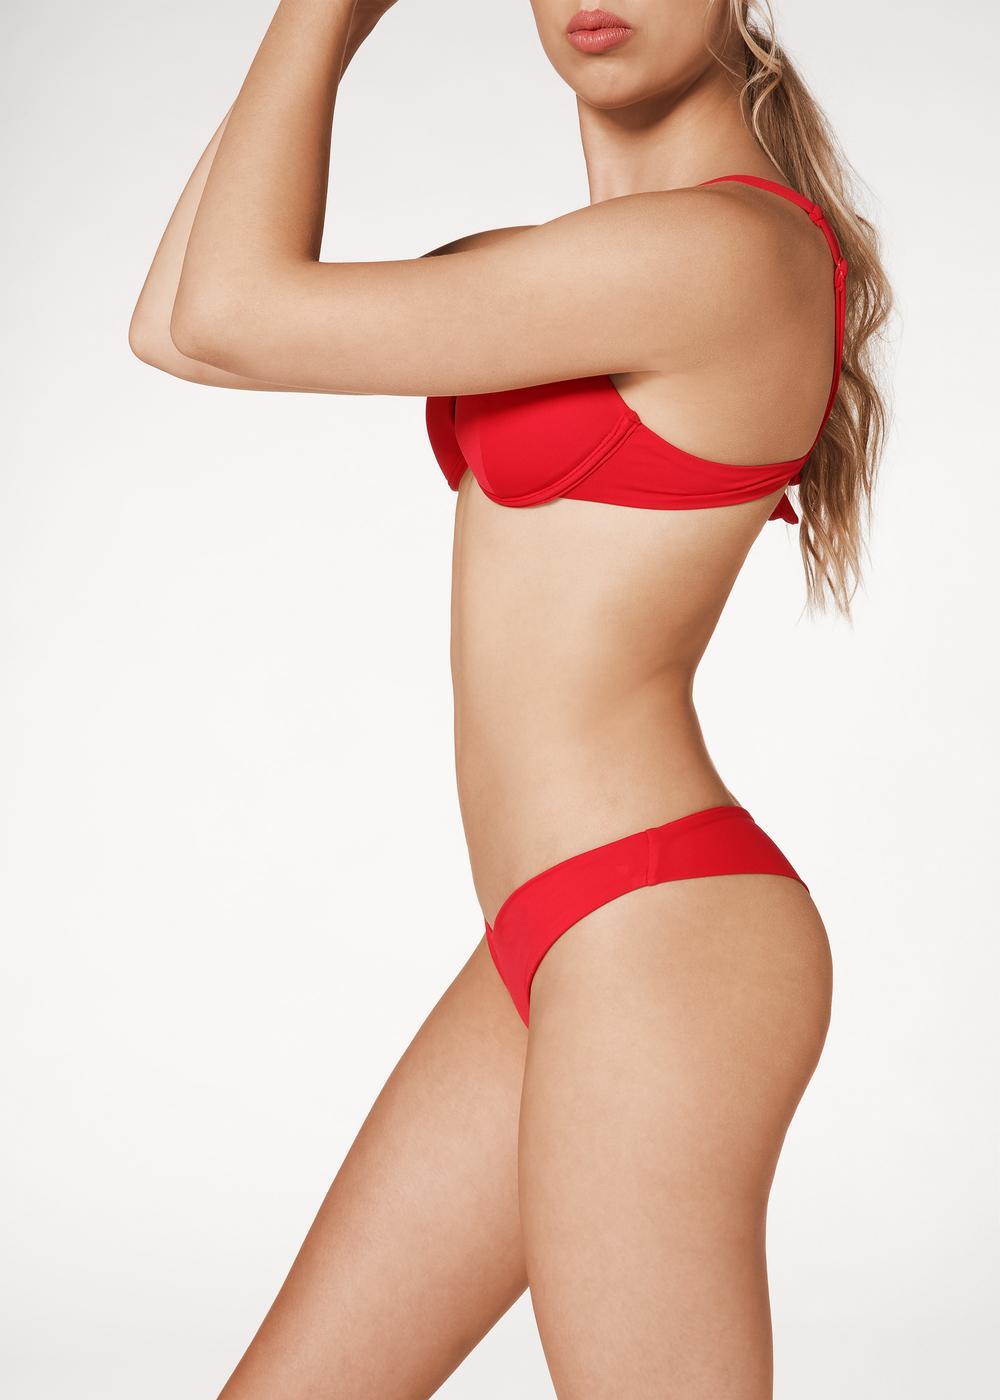 80's Indonesia Brasilian Bikini Bottom